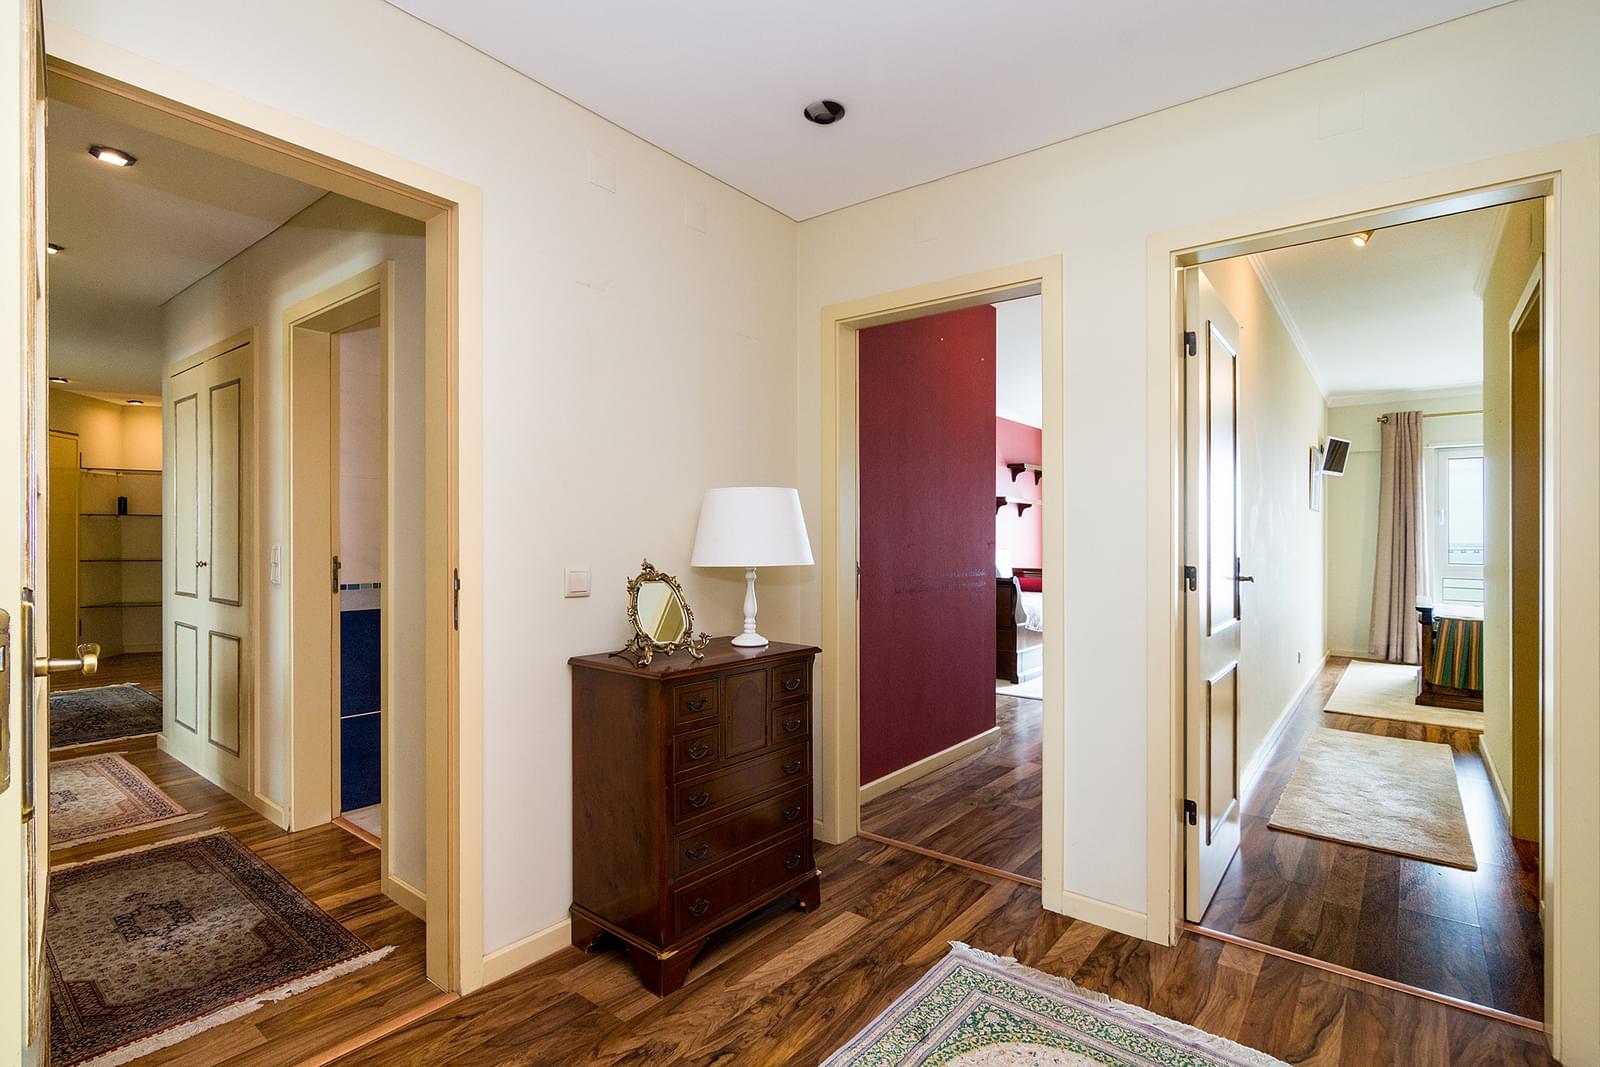 pf17449-apartamento-t4-lisboa-0a70aa6a-5343-427c-995c-6b02dfb051b6